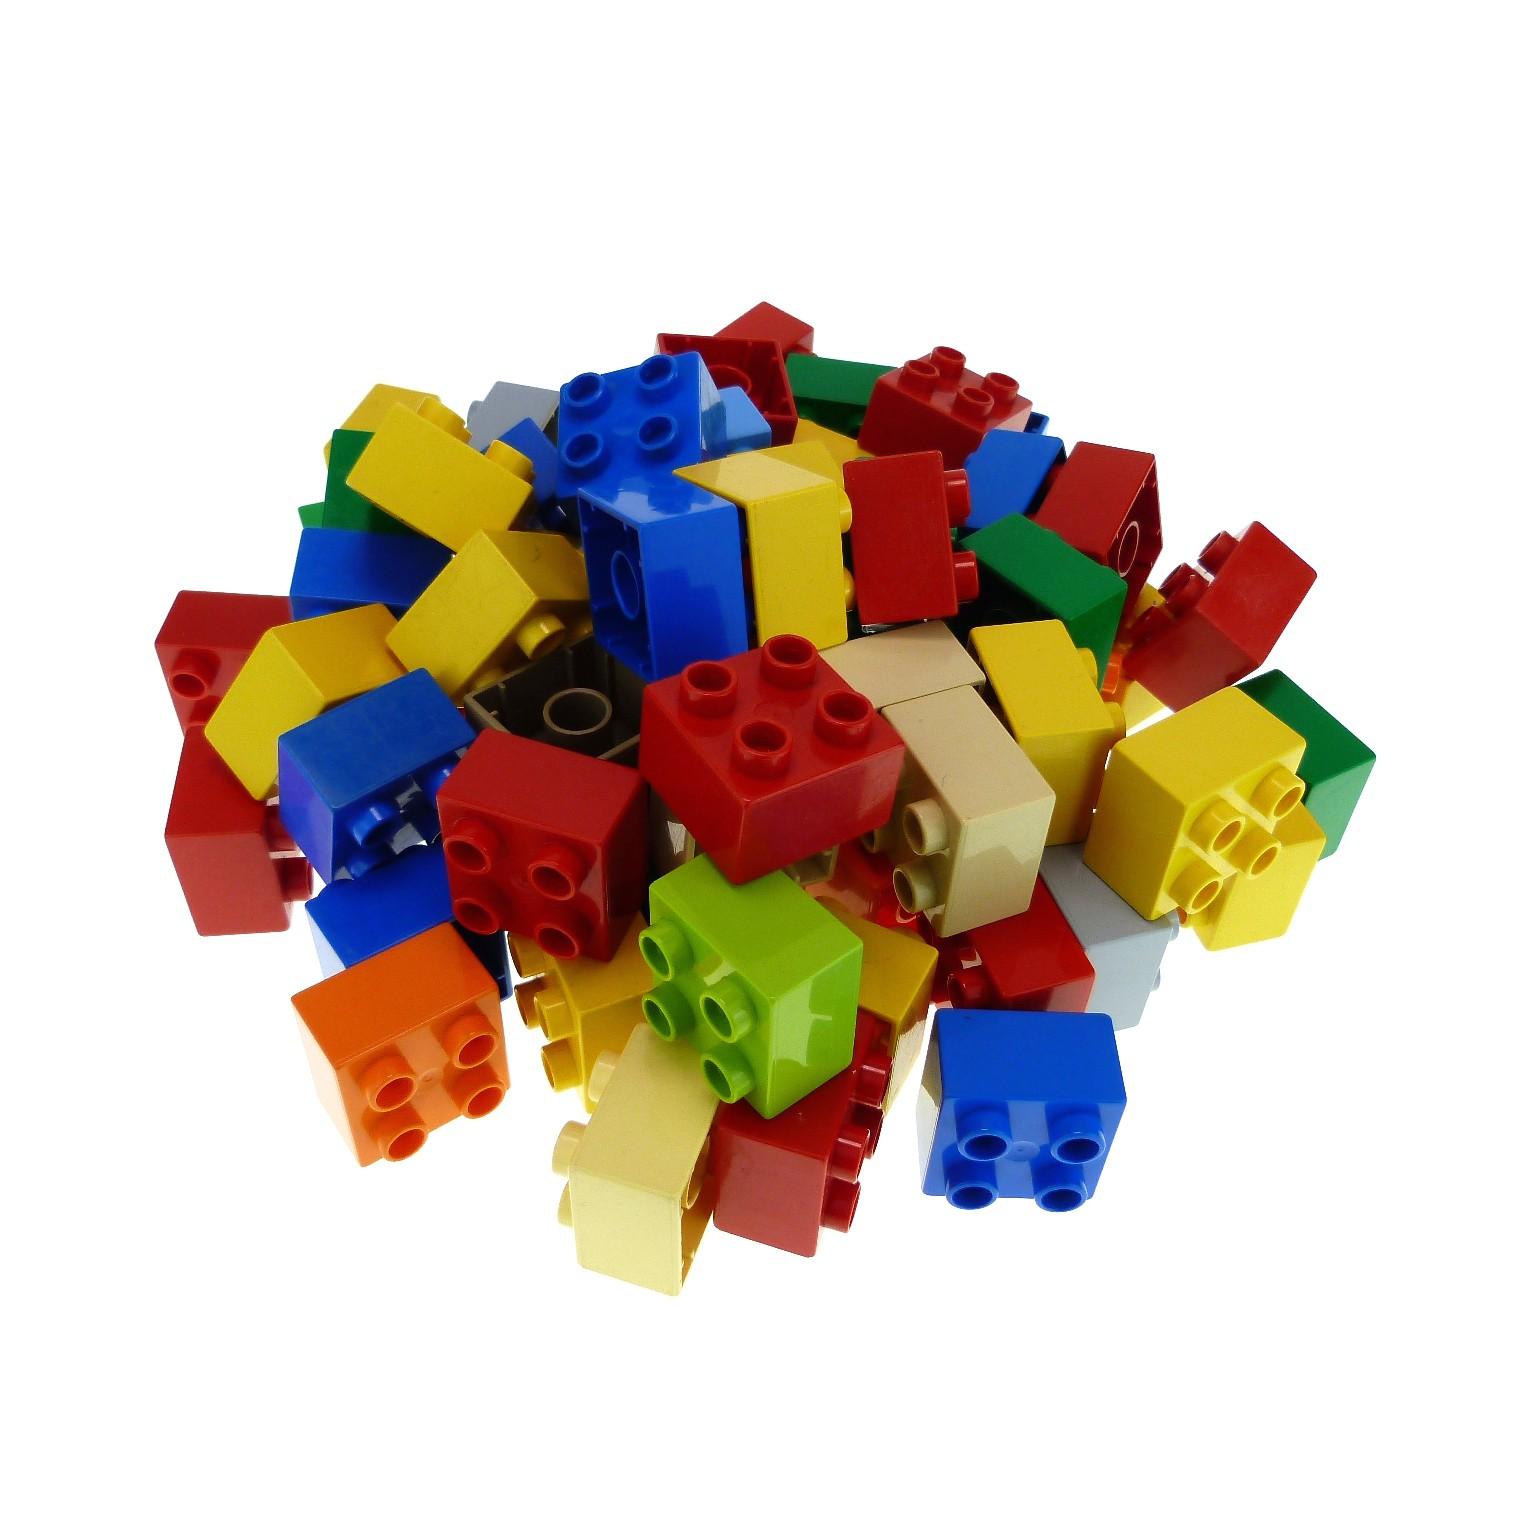 70 teile lego duplo 4er basic bausteine kiloware kg steine 2x2 noppen 3437 bunt gemischt. Black Bedroom Furniture Sets. Home Design Ideas